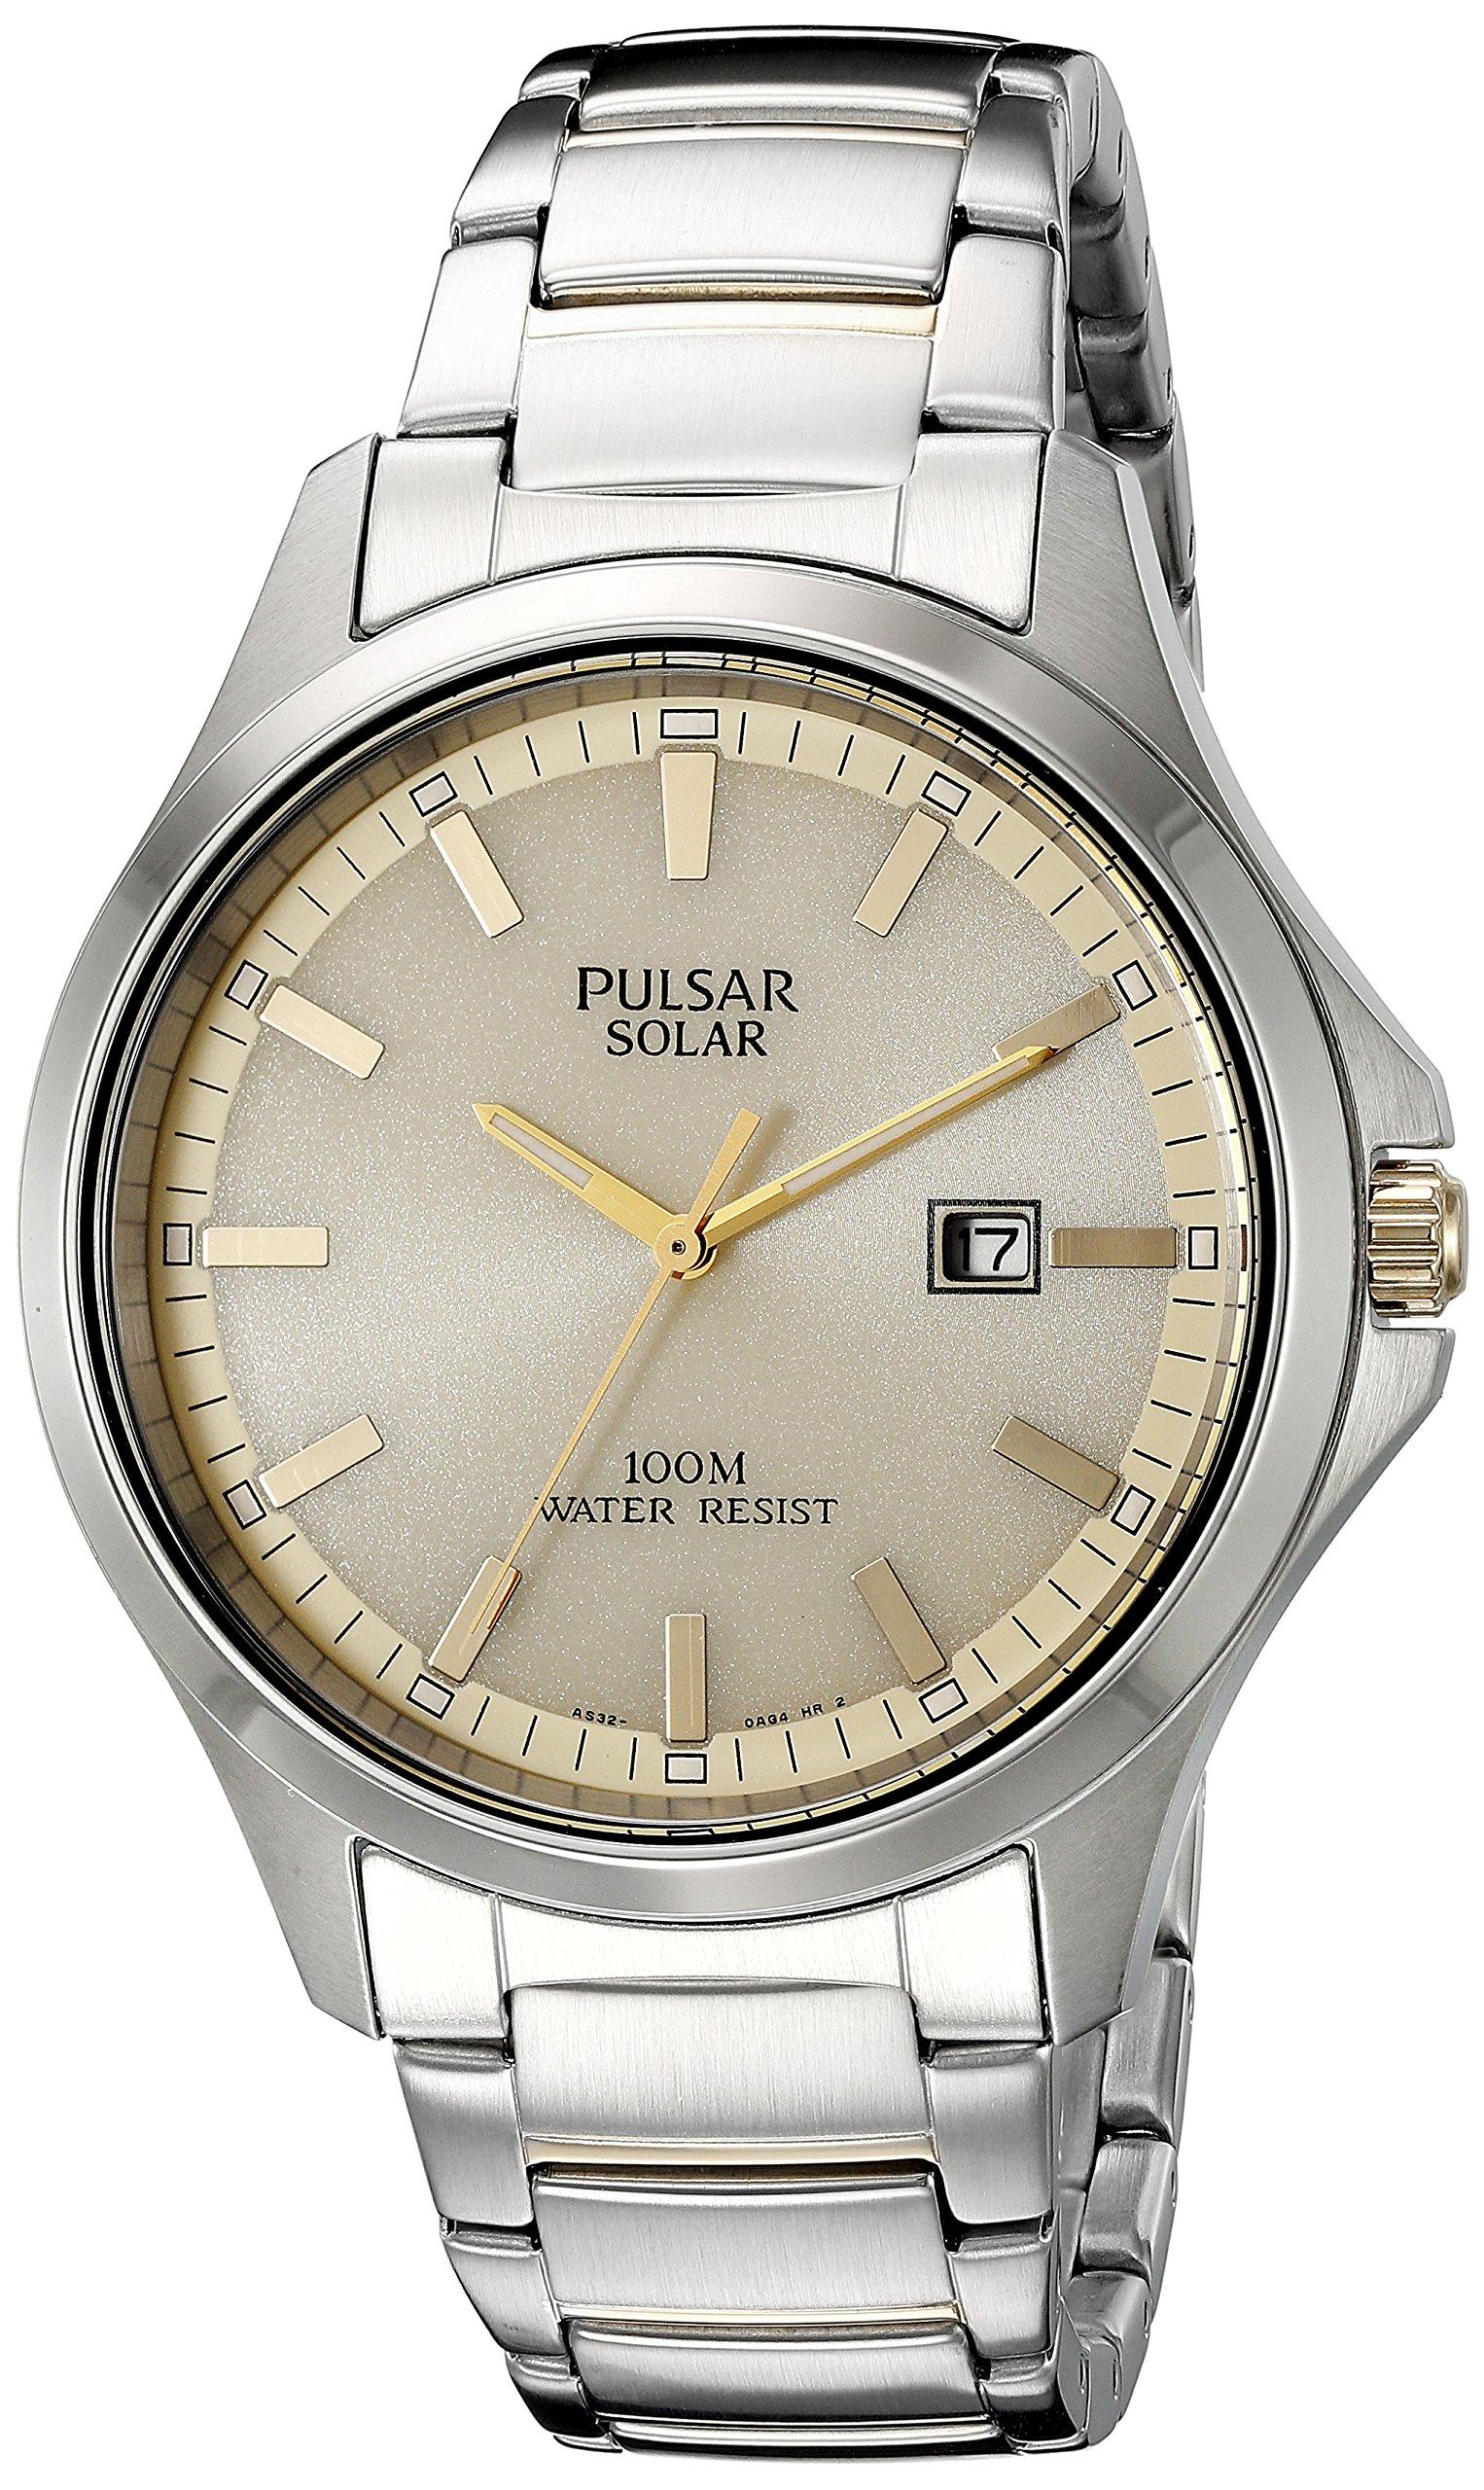 Pulsar Men's PX3075 Solar Dress Analog Display Japanese Quartz Two Tone Watch